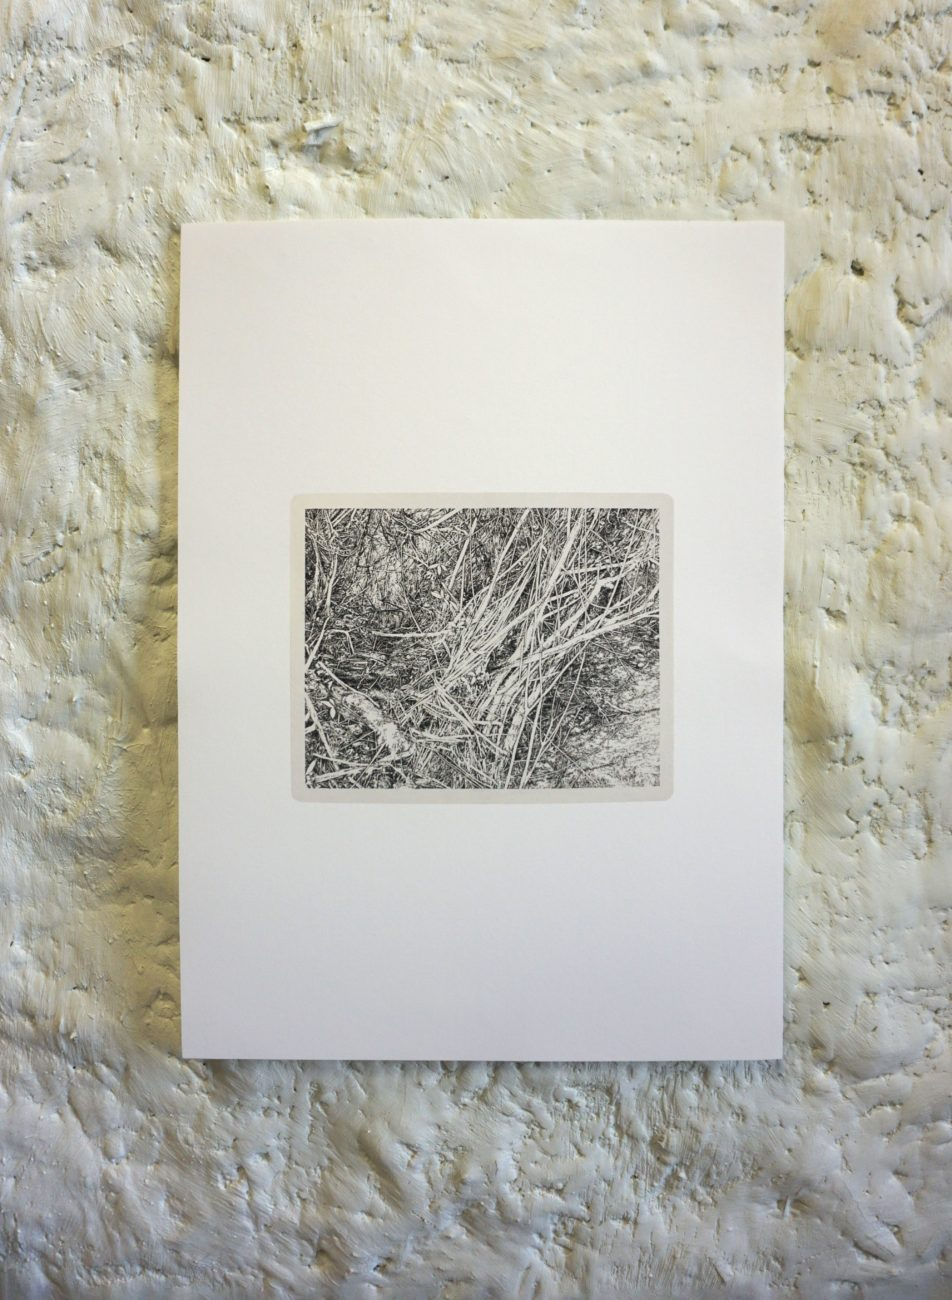 Multiples, reproduction, shop, nature, environnement, print, henninger, emmanuel, france, art, artiste